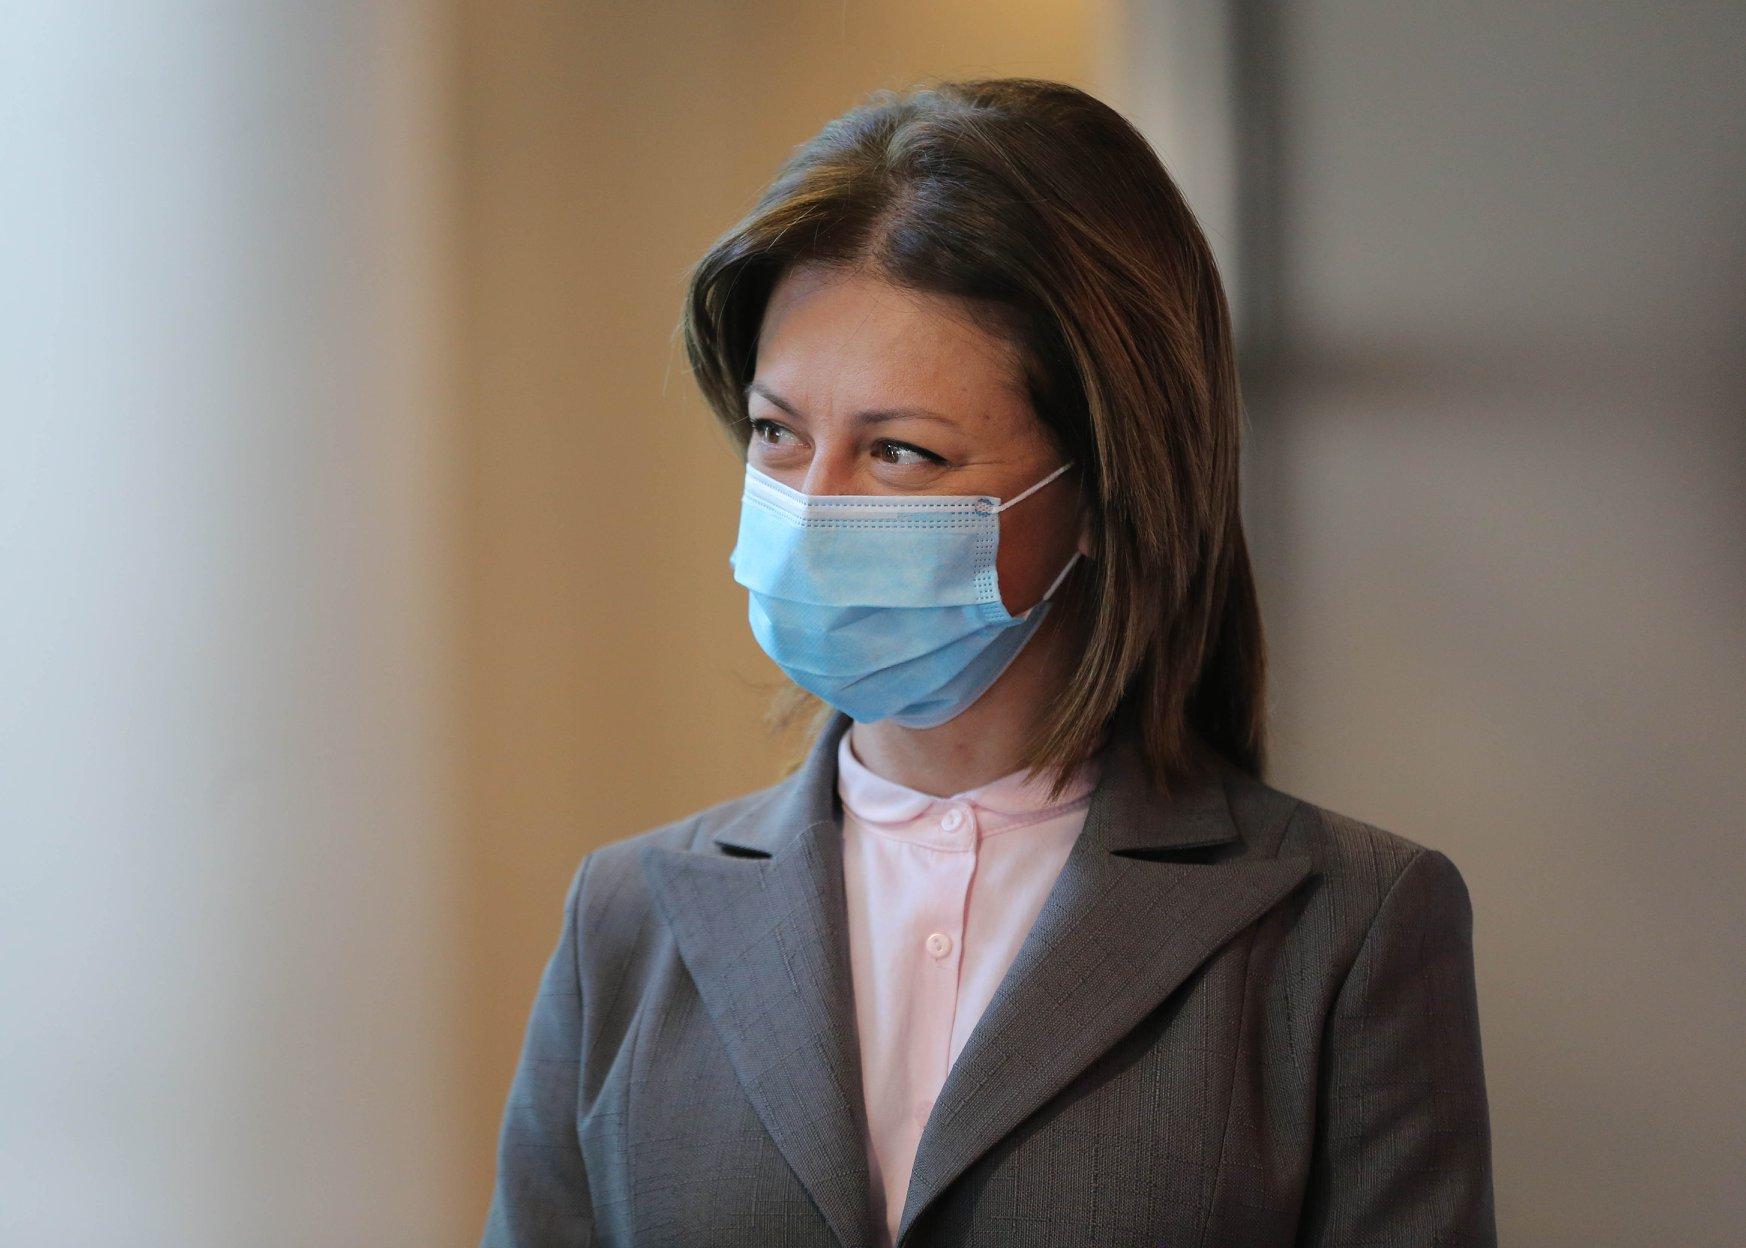 Ekaterine Tikaradze #новости Covid-19, Sinopharm, Екатерина Тикарадзе, коронавирус в Грузии